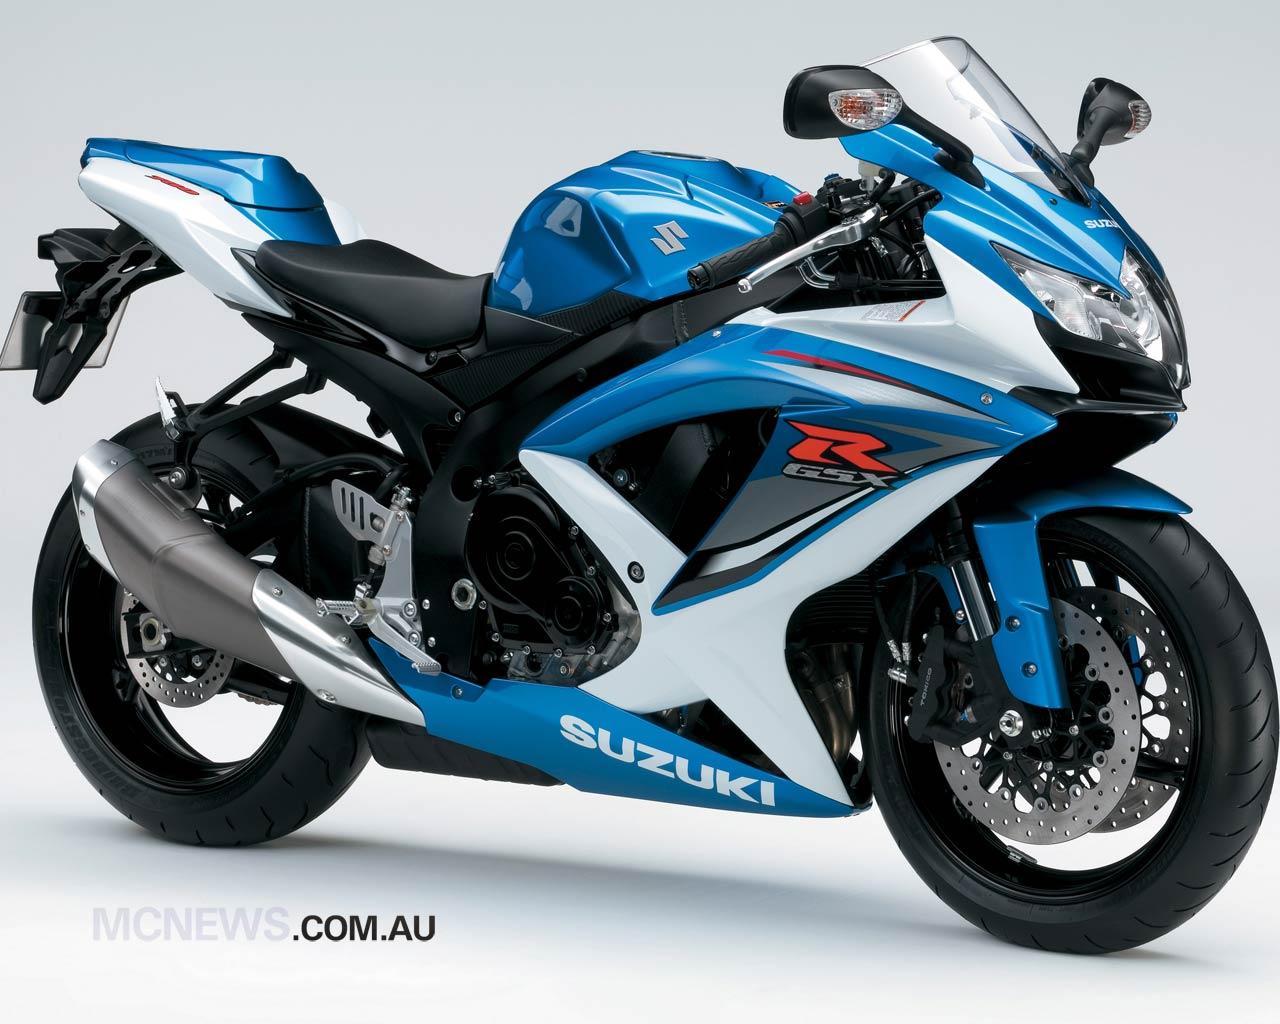 Suzuki Gsxr 750 Wallpaper 6912 Hd Wallpapers in Bikes   Imagescicom 1280x1024